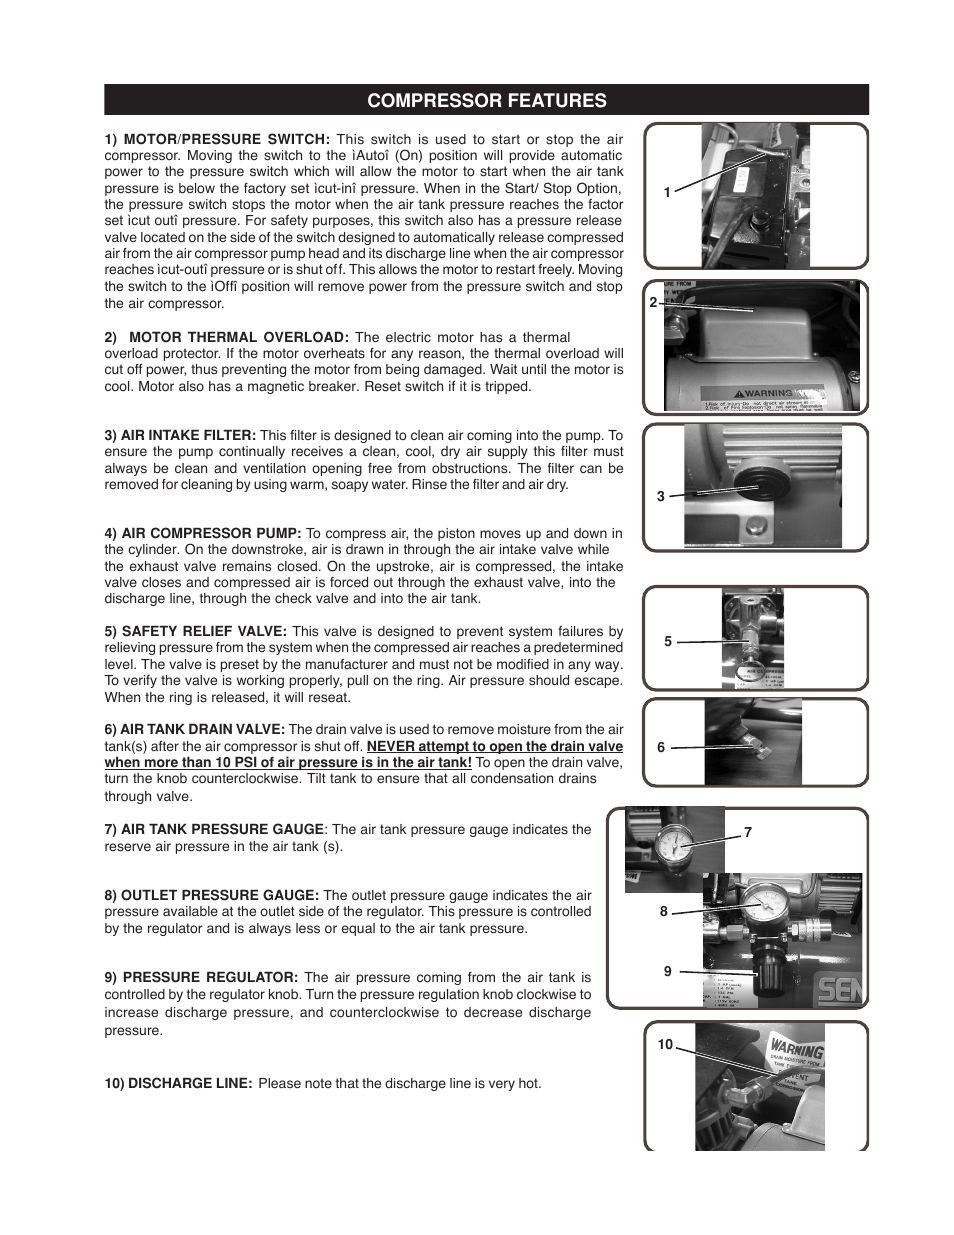 Compressor features | Senco PC1010 User Manual | Page 9 / 16